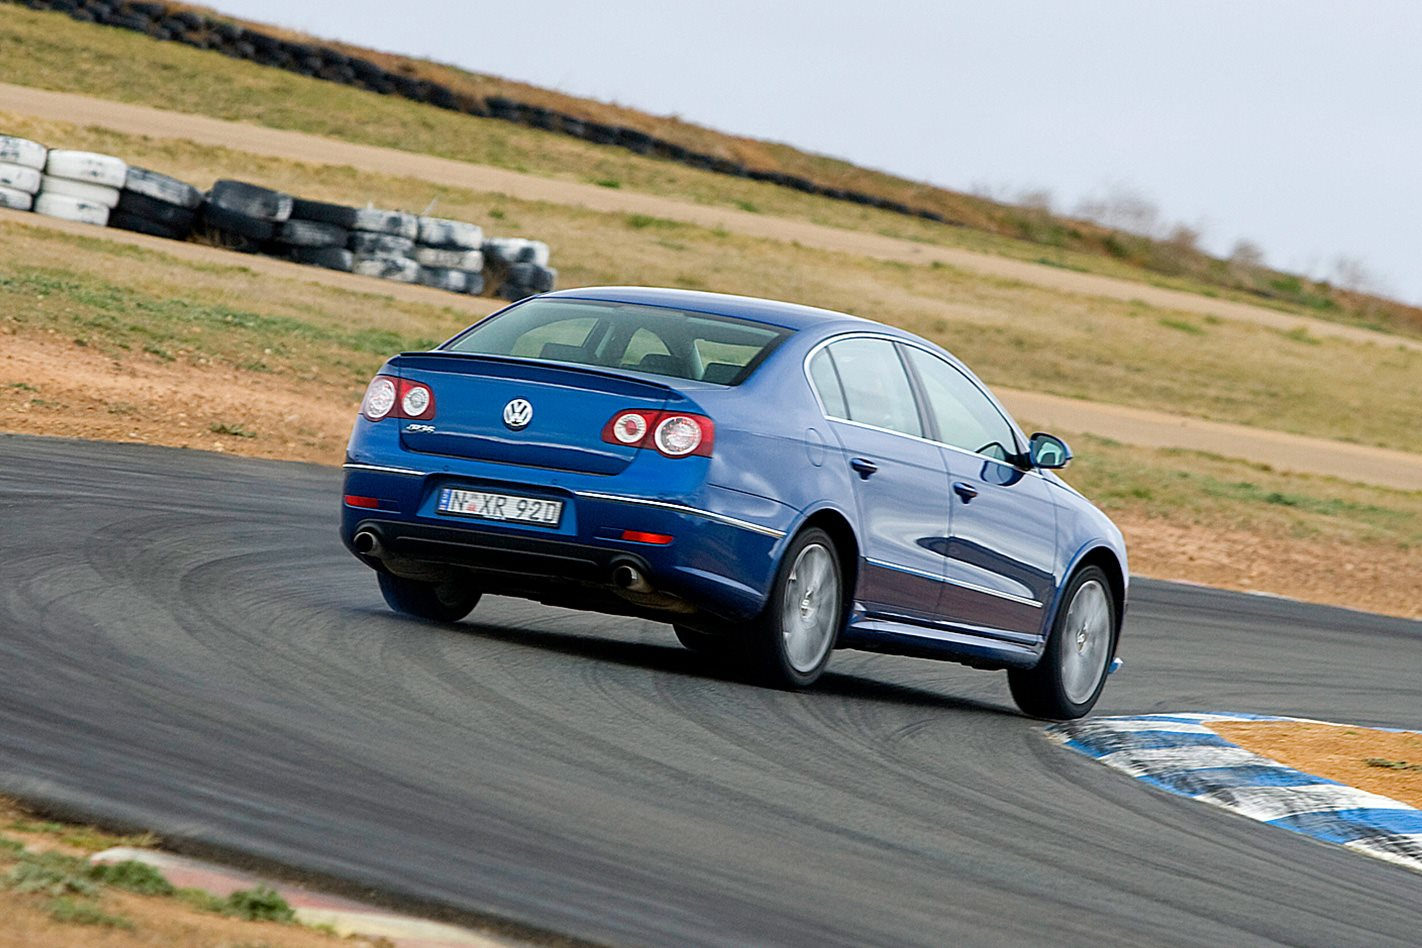 2008-Volkswagen-Passat-R36-rear.jpg